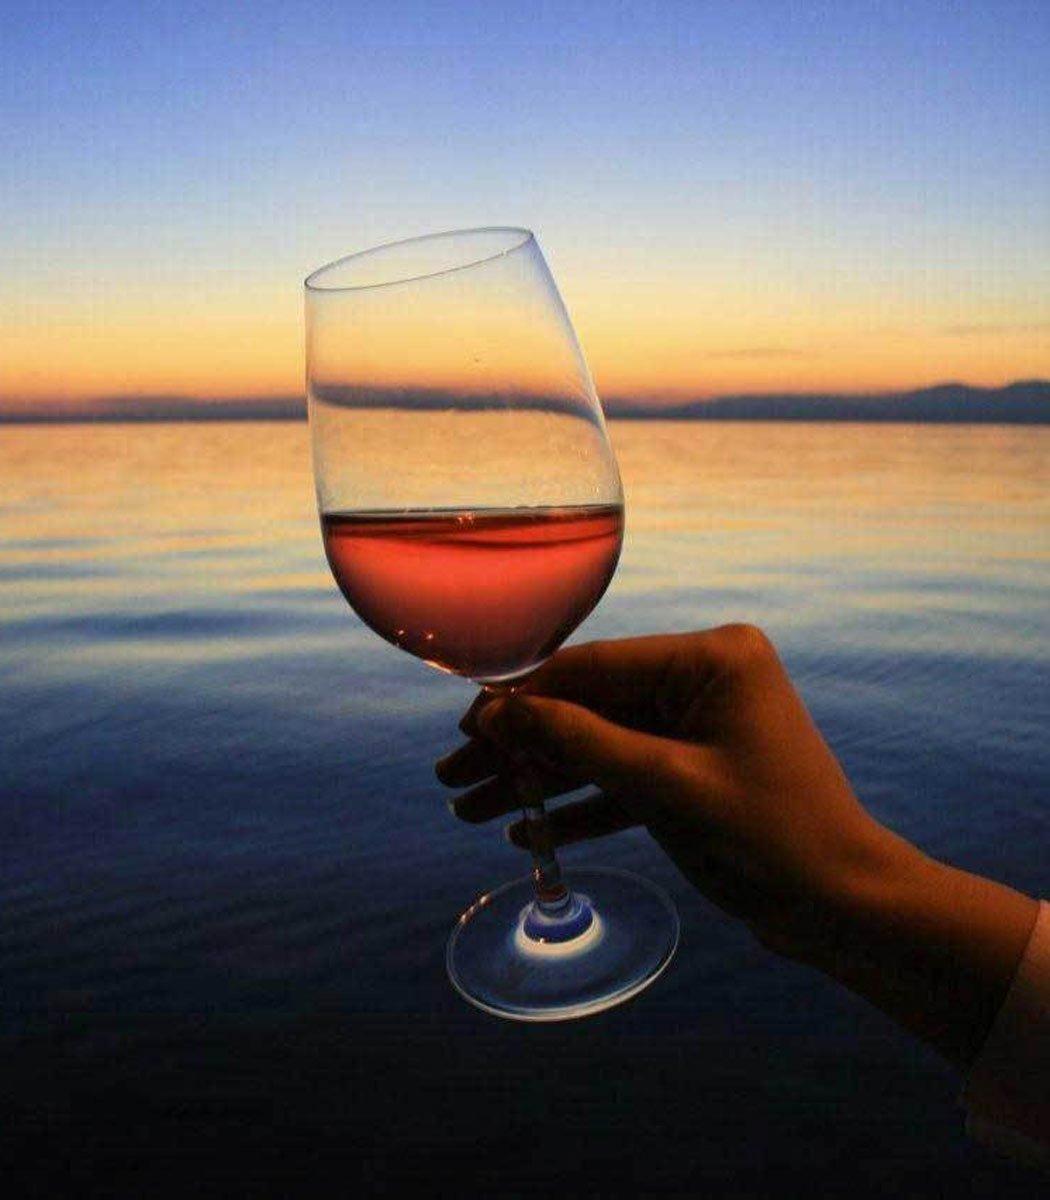 tasting - and-lake-garda-wine